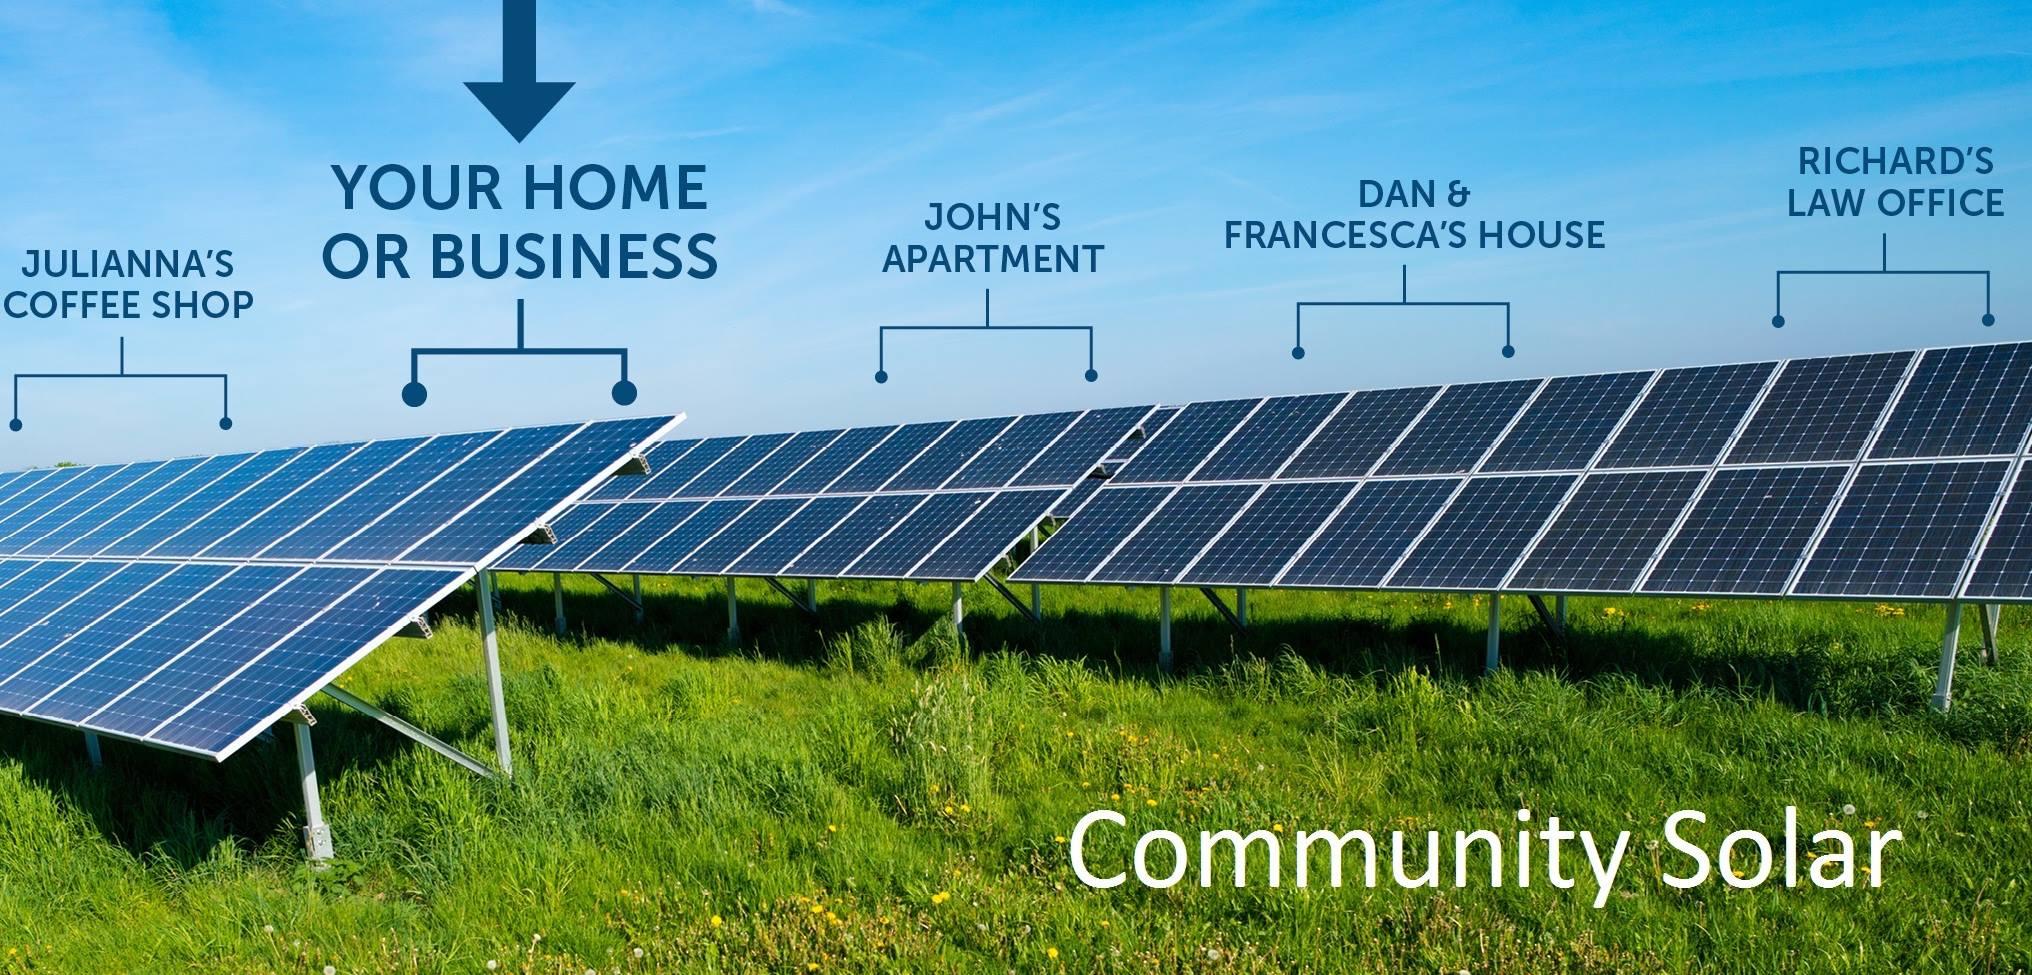 community_solar.jpg